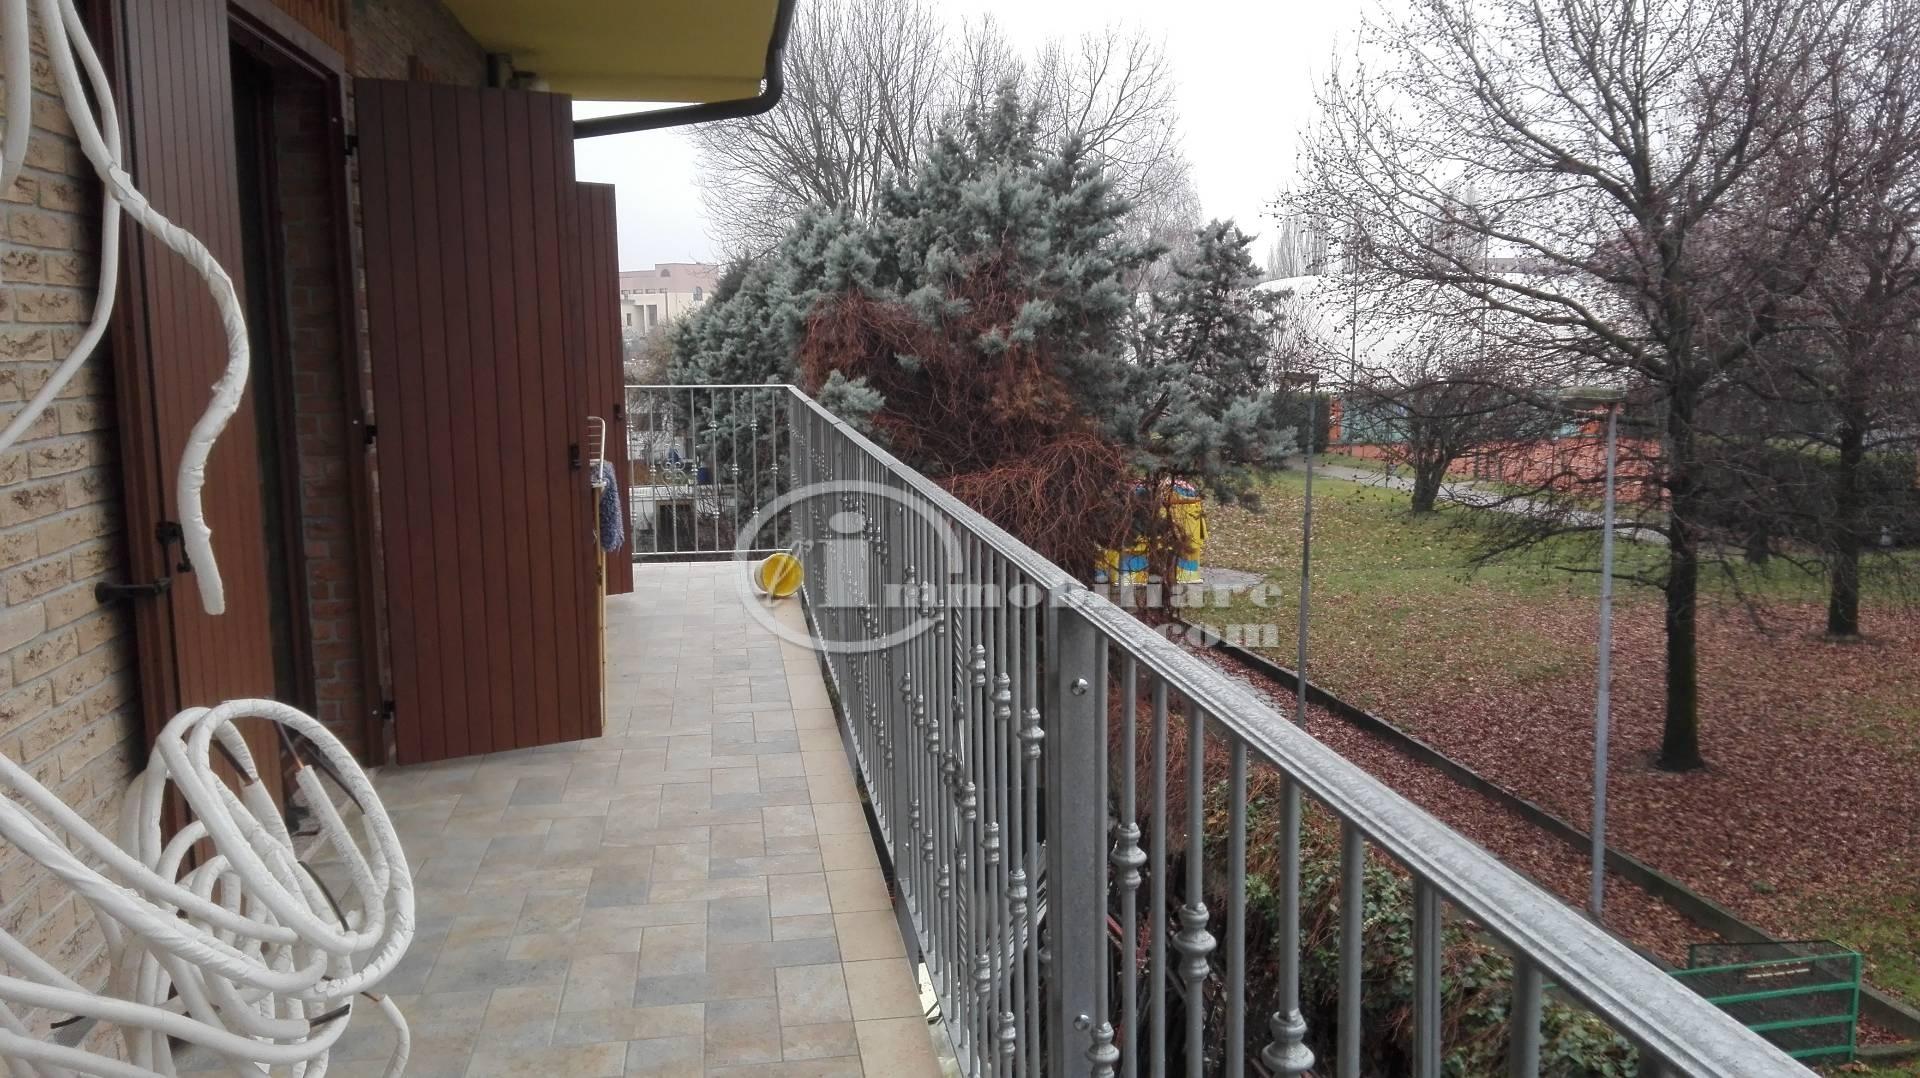 Villa in Vendita a Novate Milanese: 3 locali, 130 mq